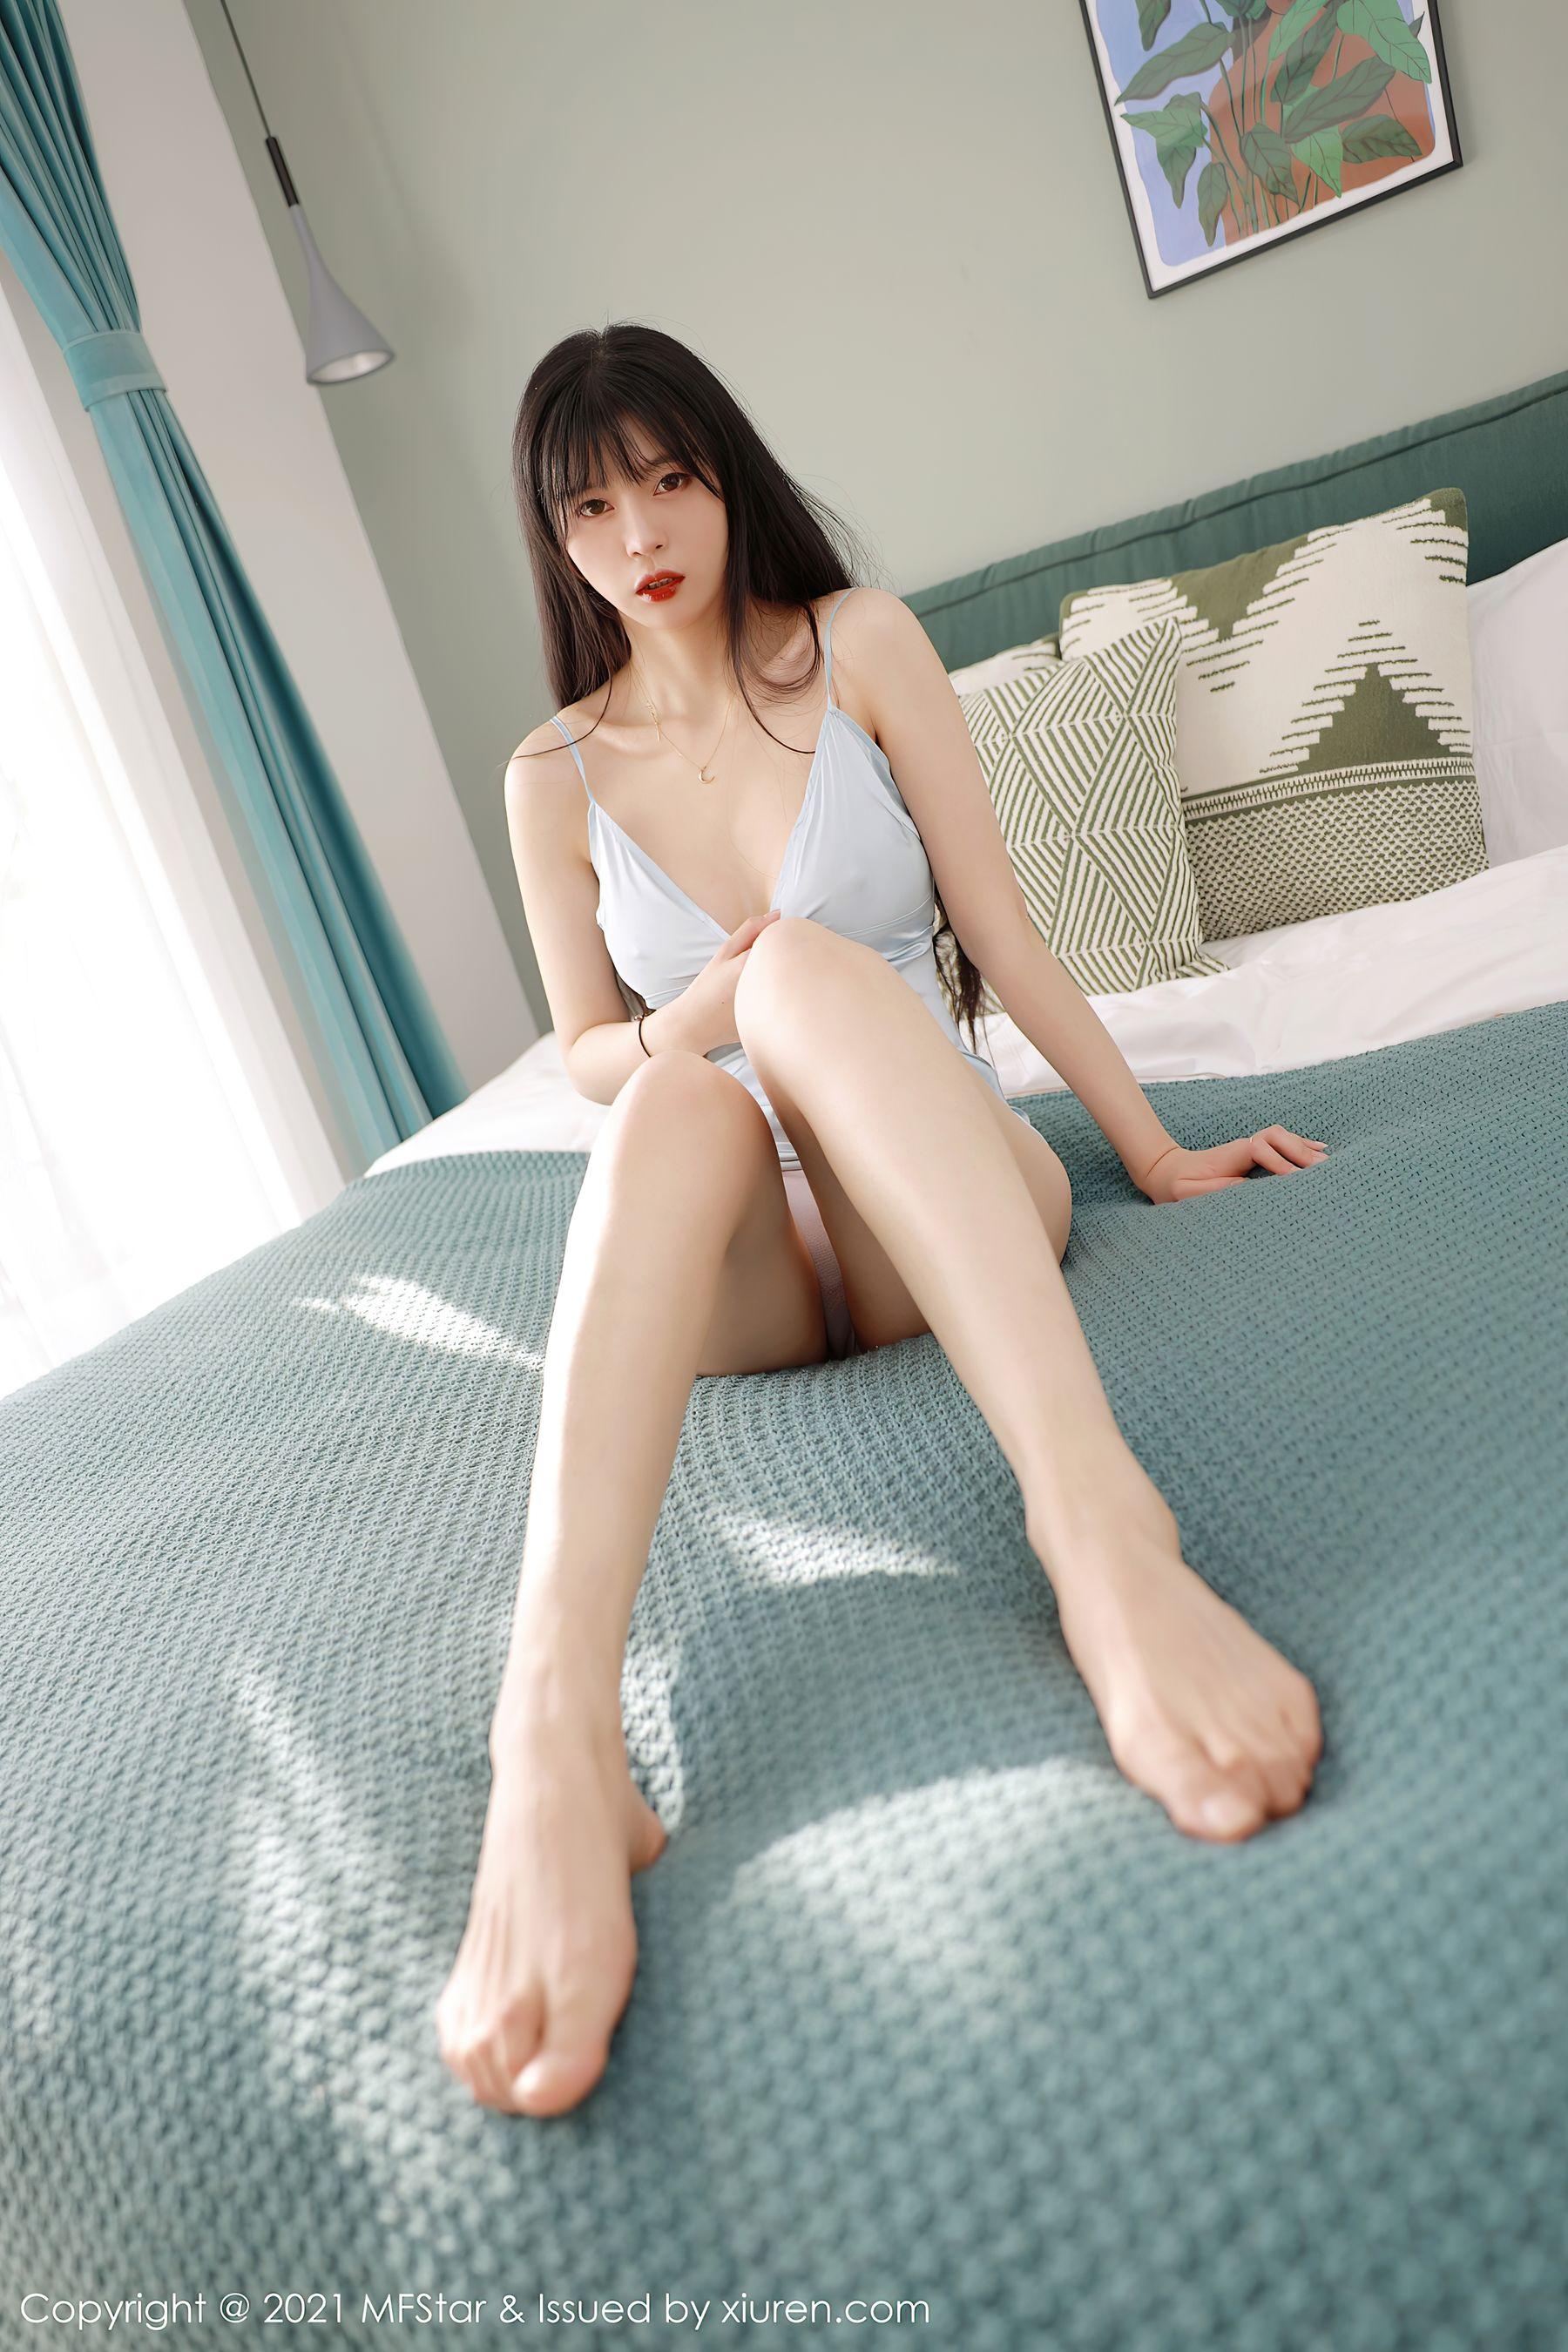 VOL.1678 [模范学院]美乳床上:桃香子(模特桃香子)超高清写真套图(41P)